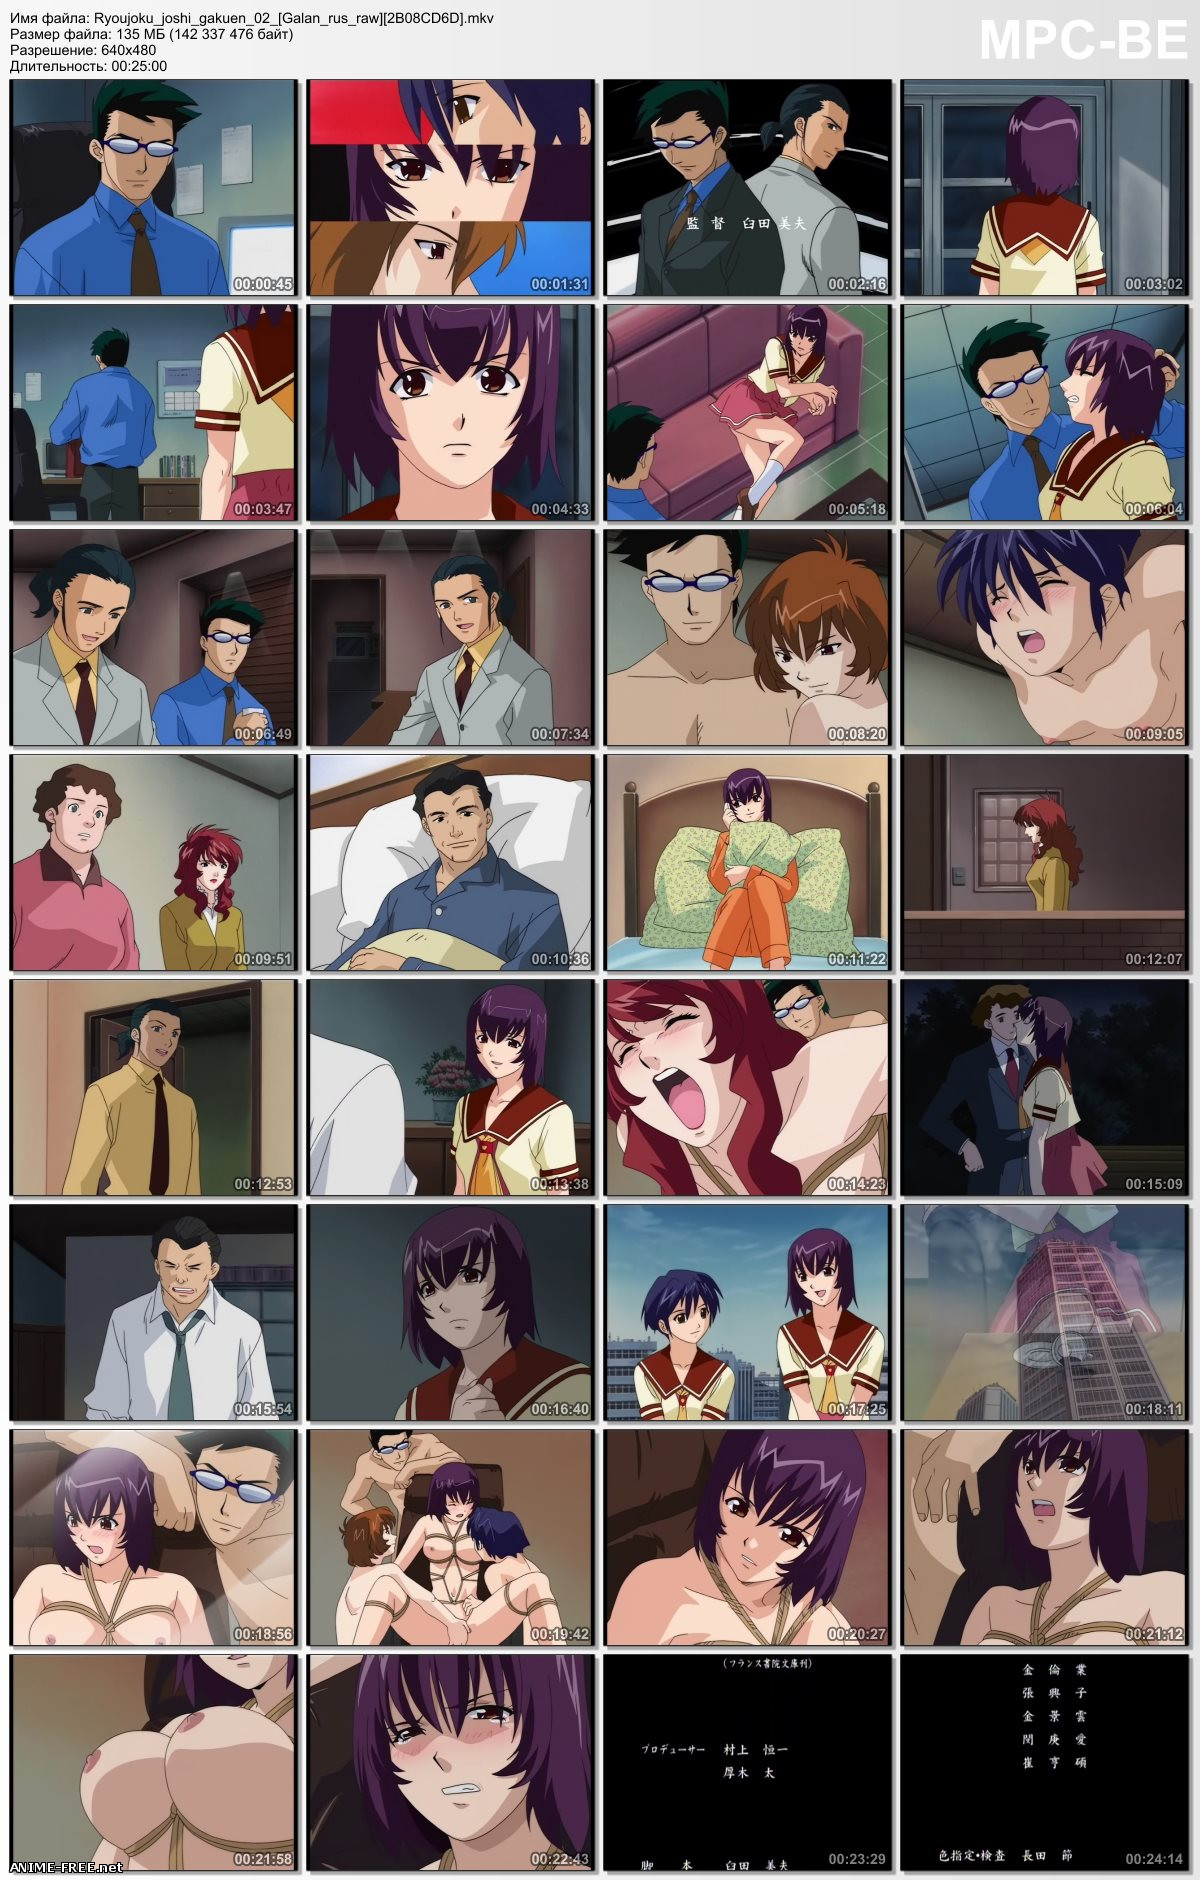 Ryoujoku Joshi Gakuen / Школа унижения девушки [Ep.1-2] [JAP,CHI,ENG,KOR] Anime Hentai